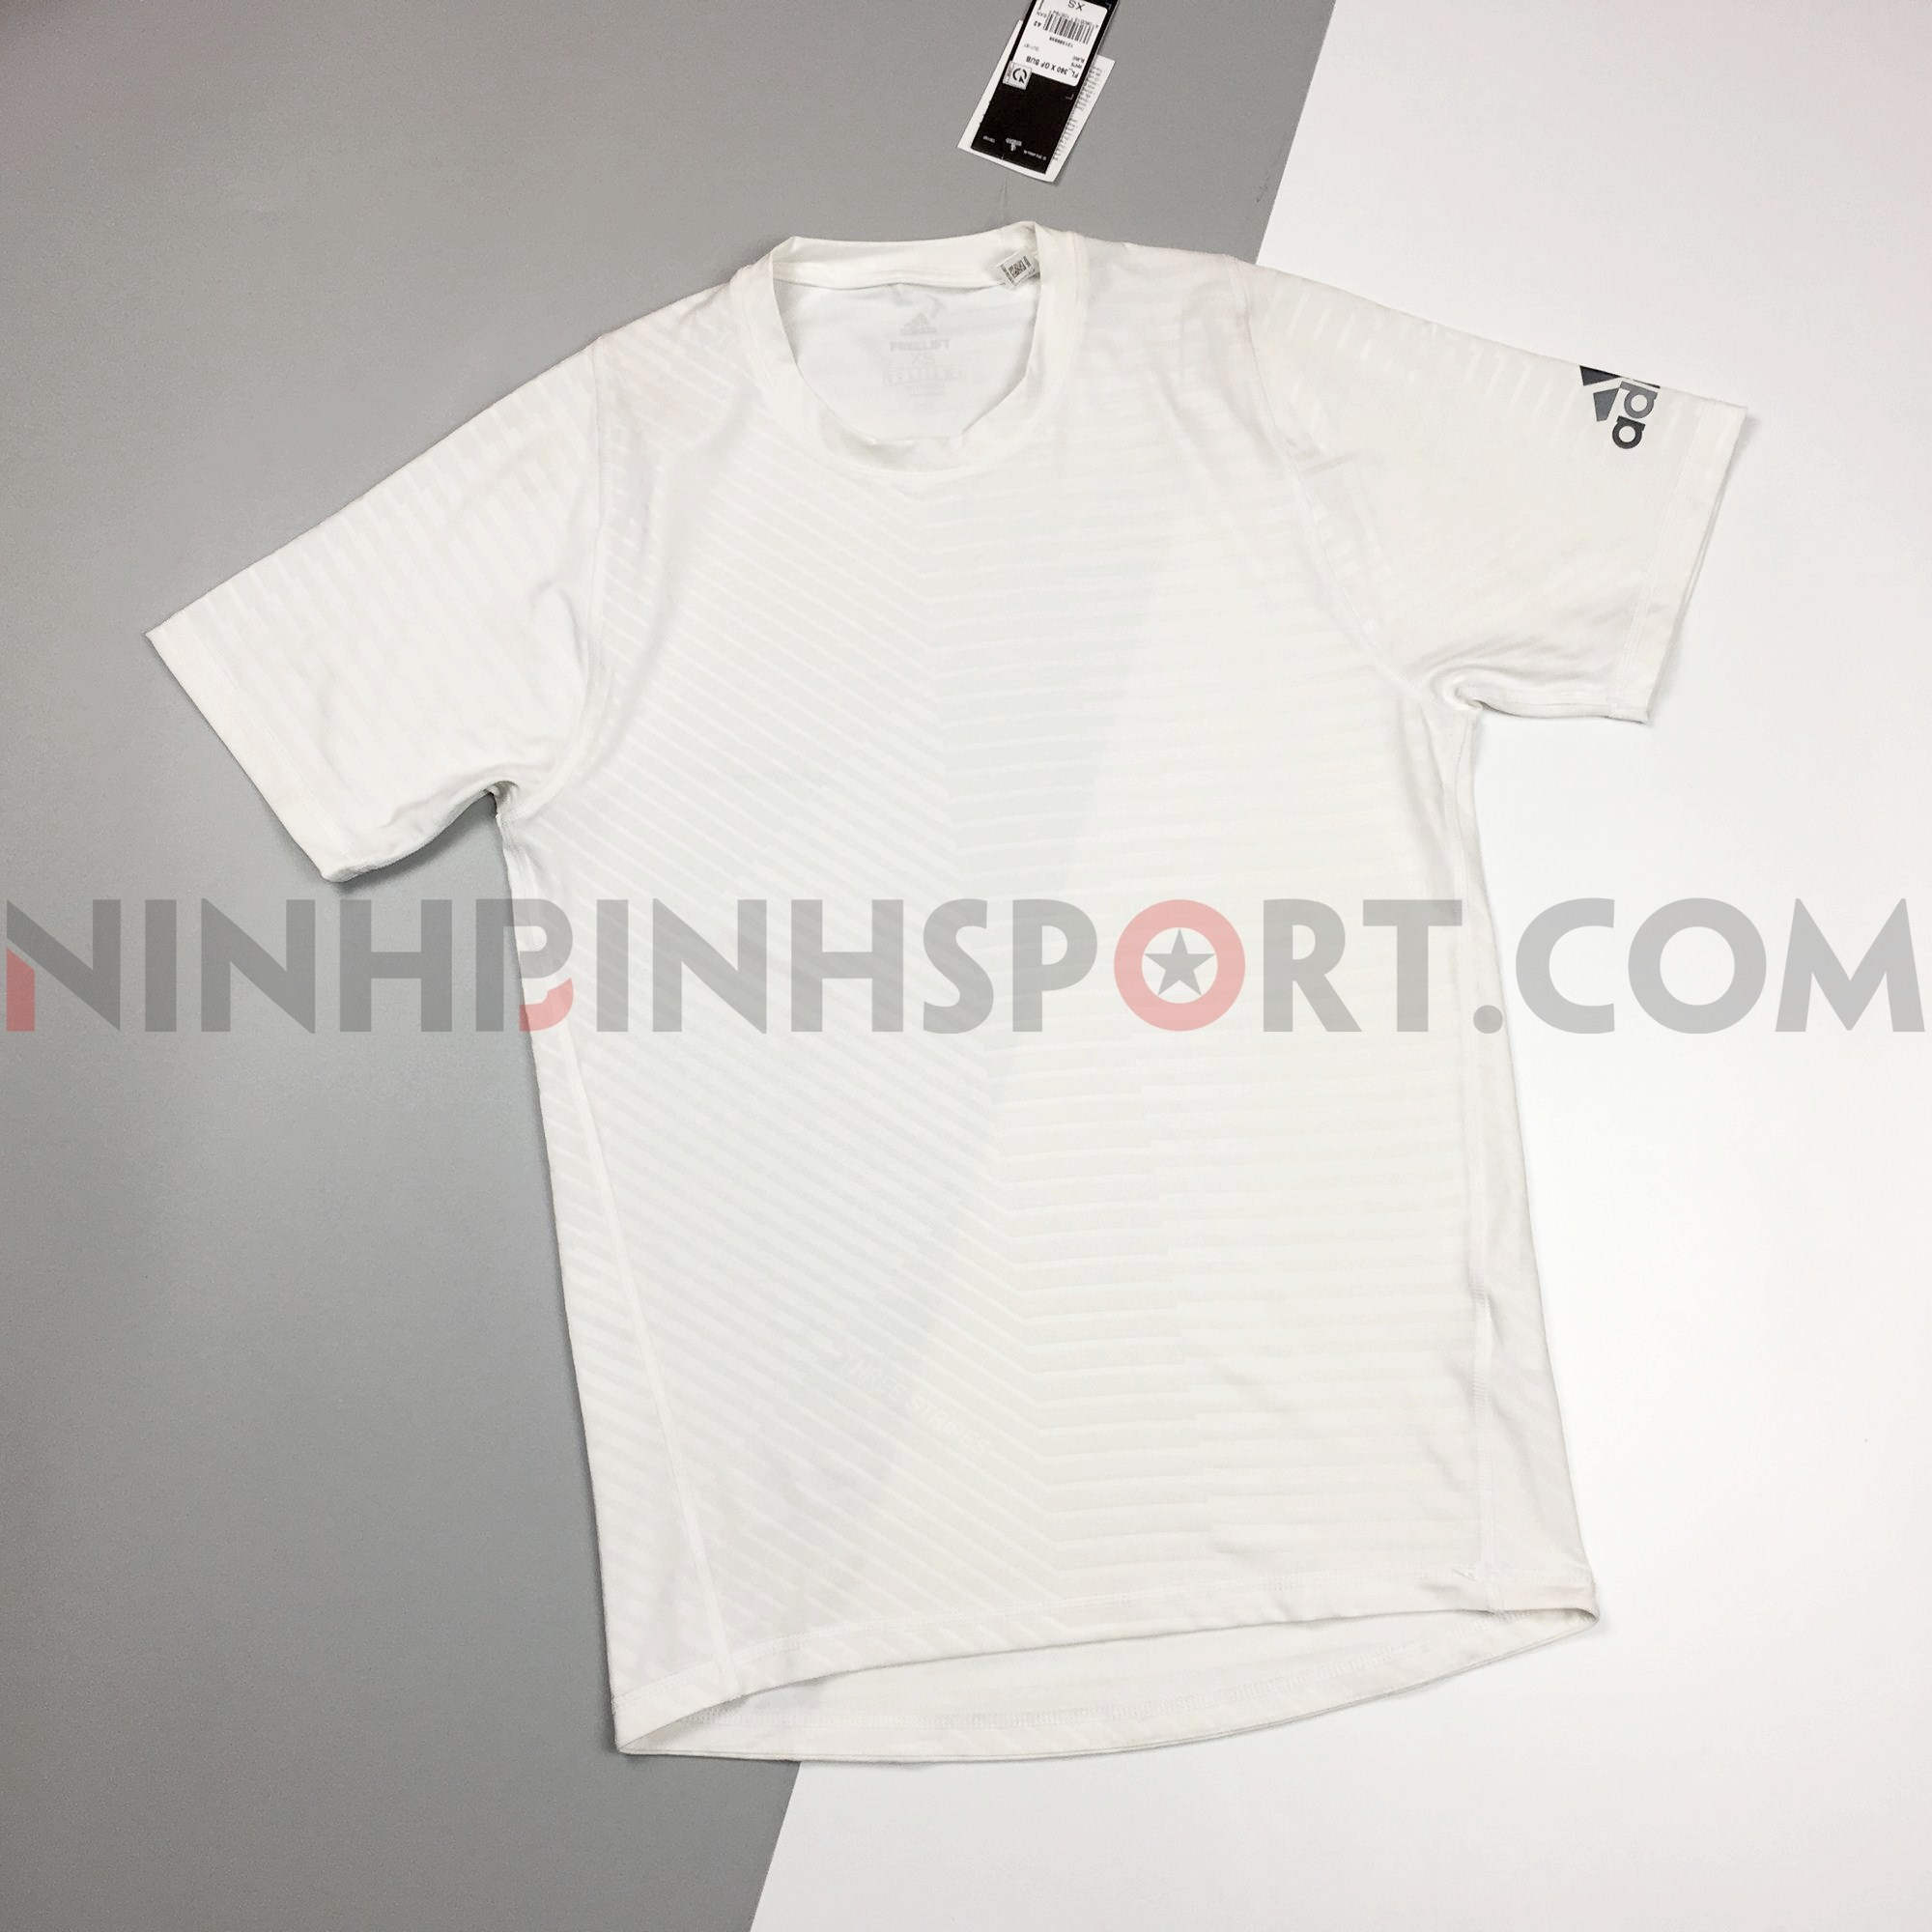 Áo thể thao nam Adidas FreeLift 360 Subtle Graphic DU1187